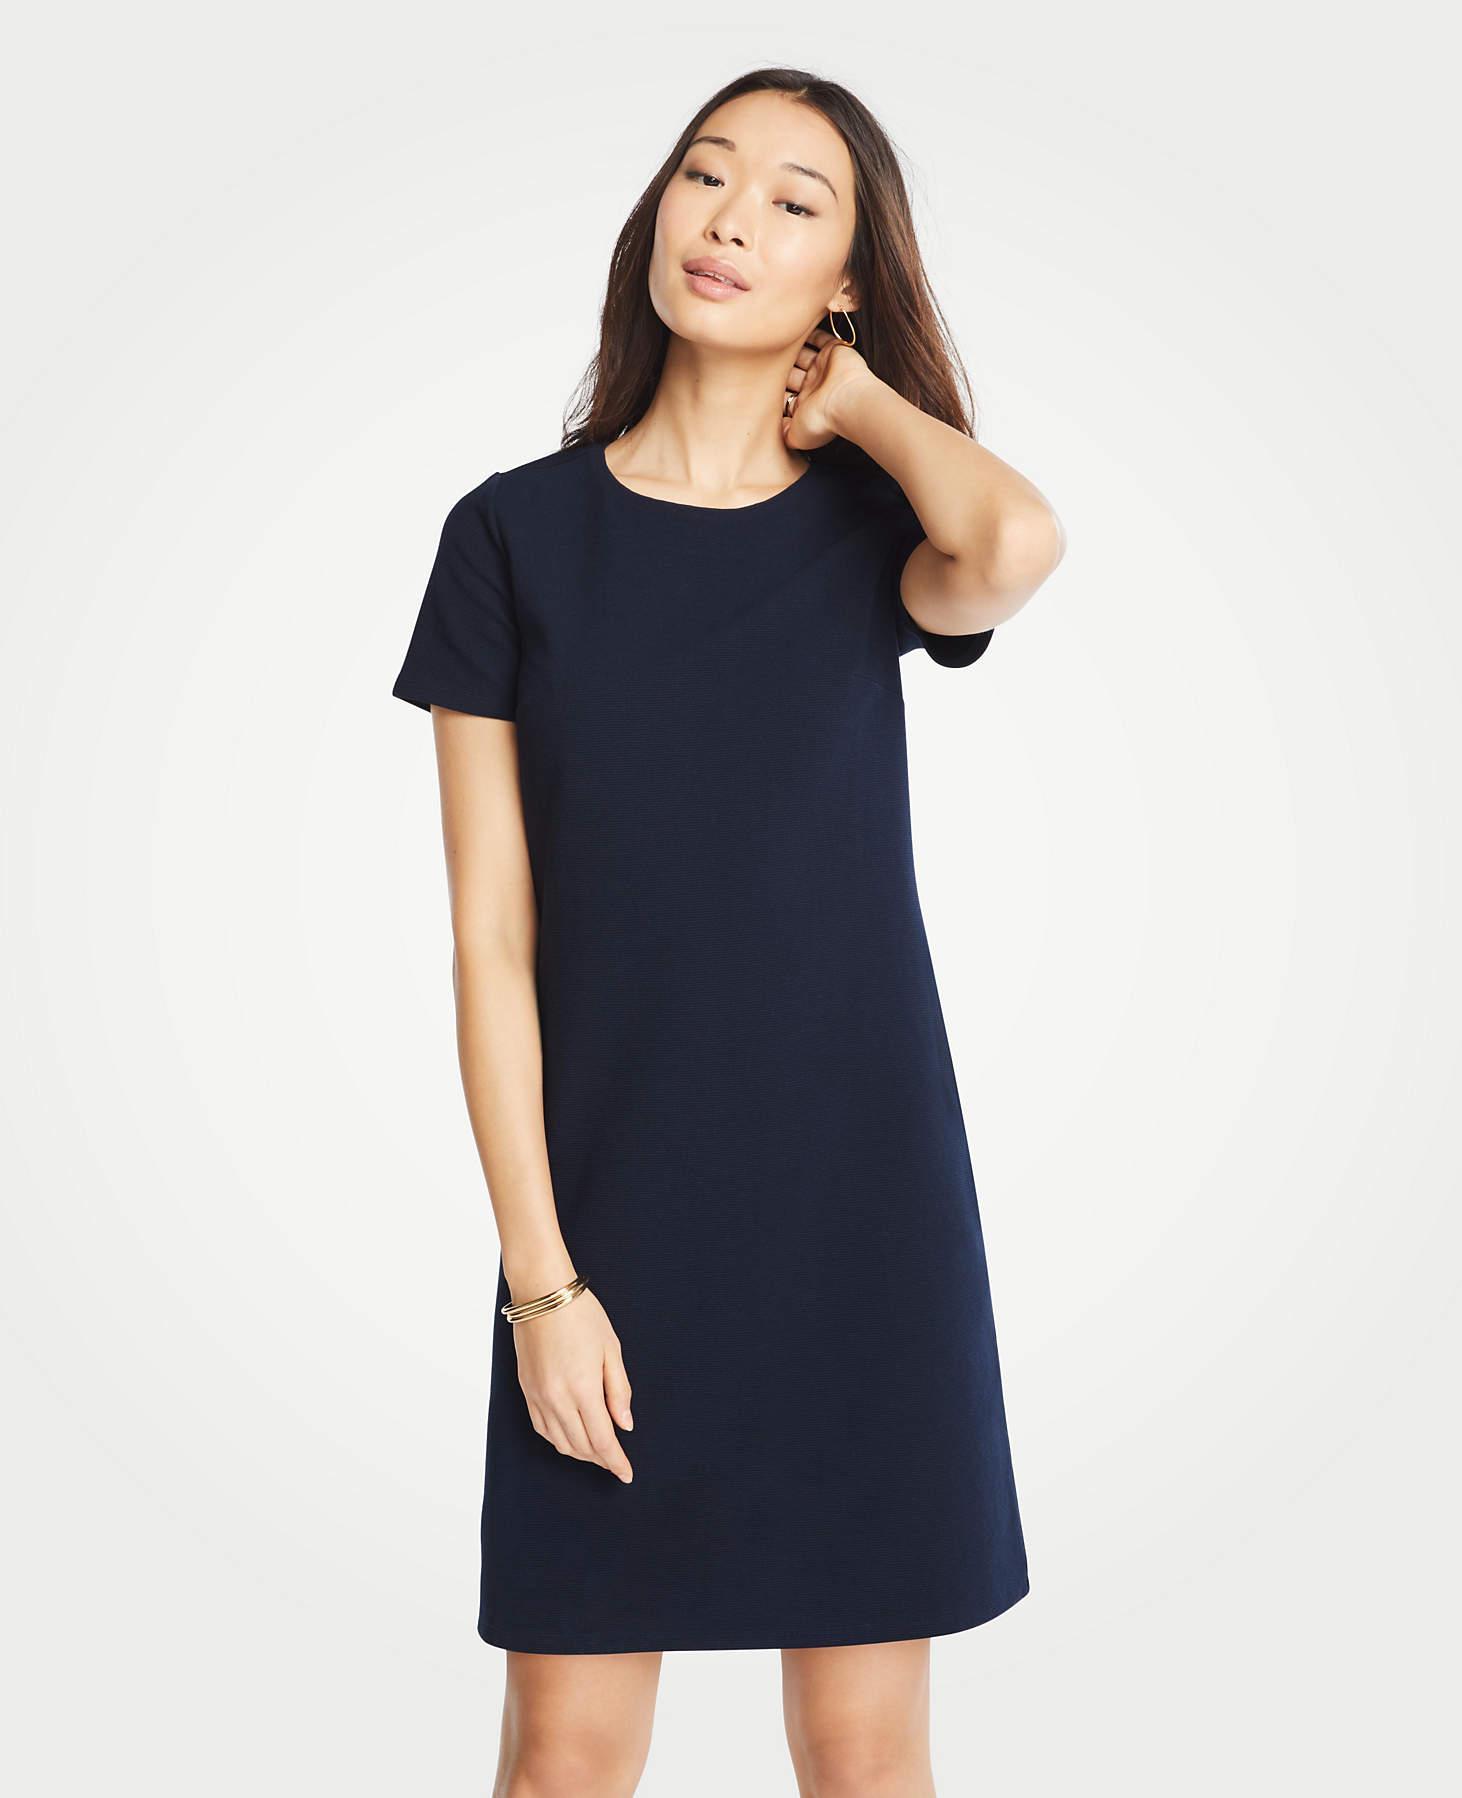 adcbcb8991d Ann Taylor Petite Short Sleeve Shift Dress in Blue - Lyst